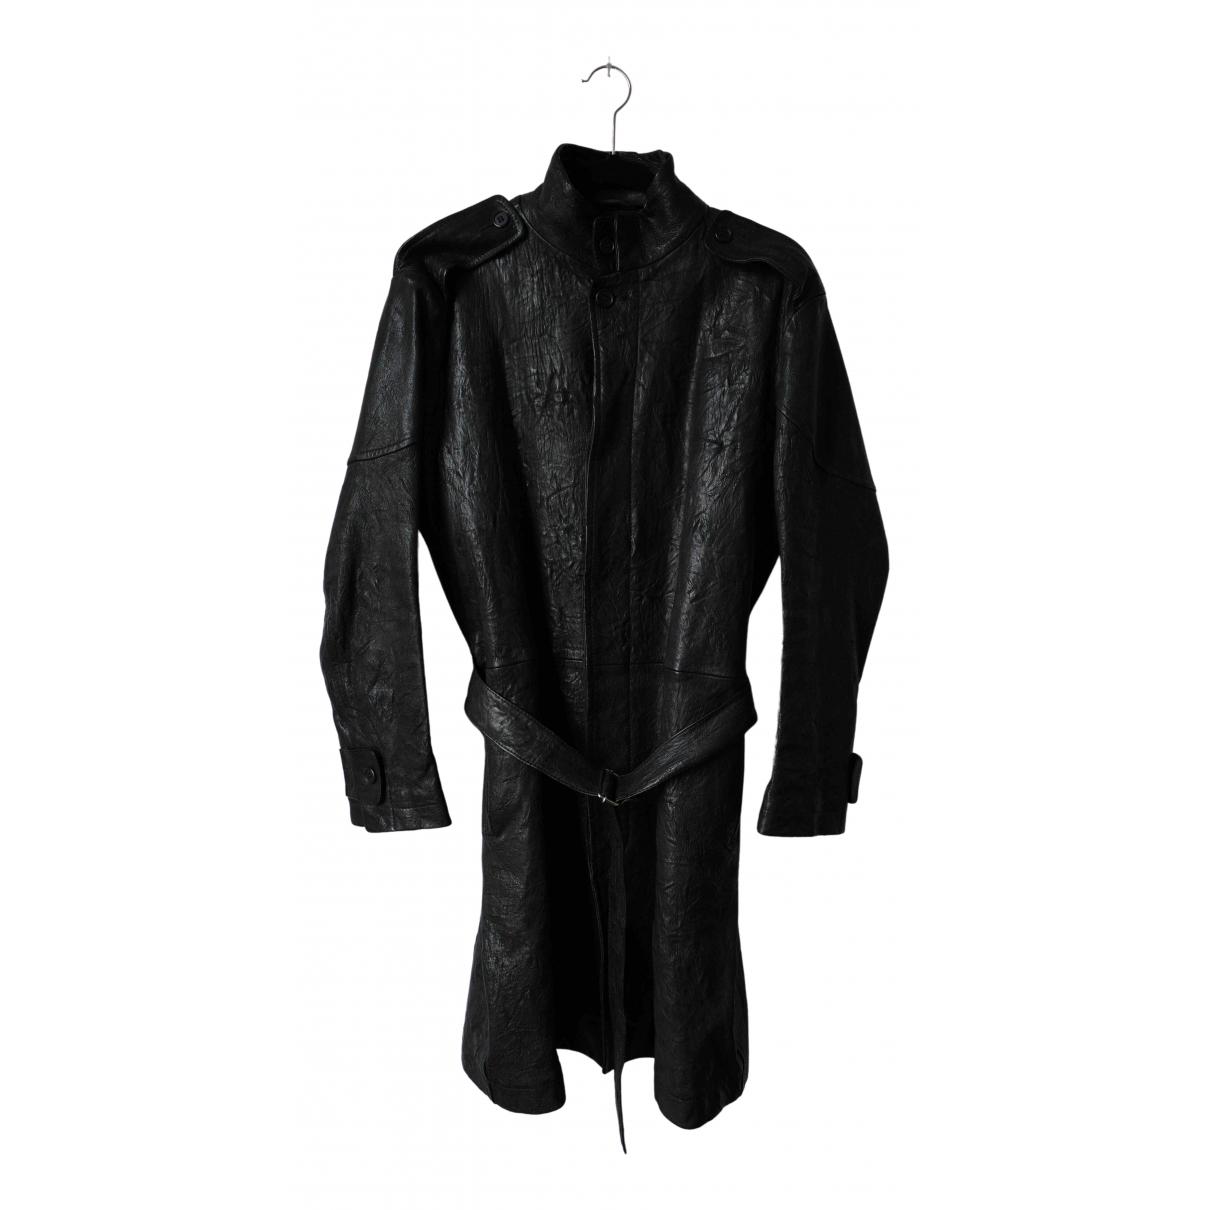 Yohji Yamamoto - Blouson   pour femme en cuir - noir